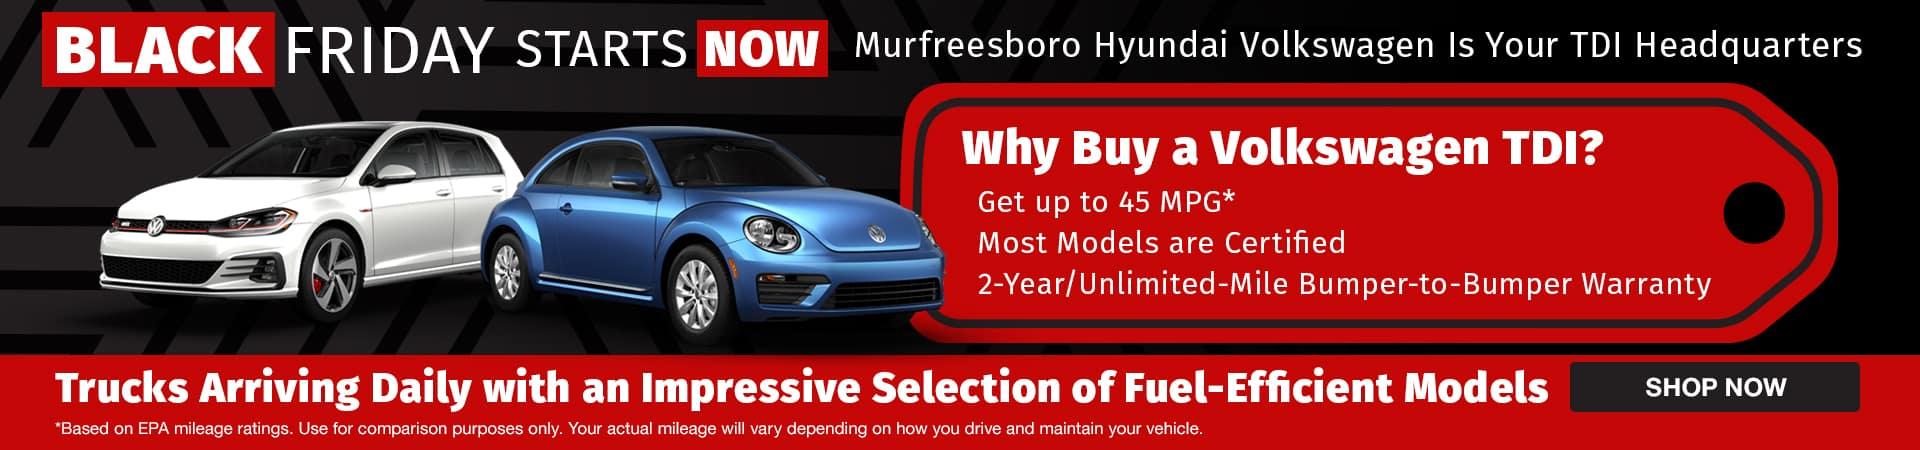 Used Volkswagen TDis for sale in Murfreesboro TN